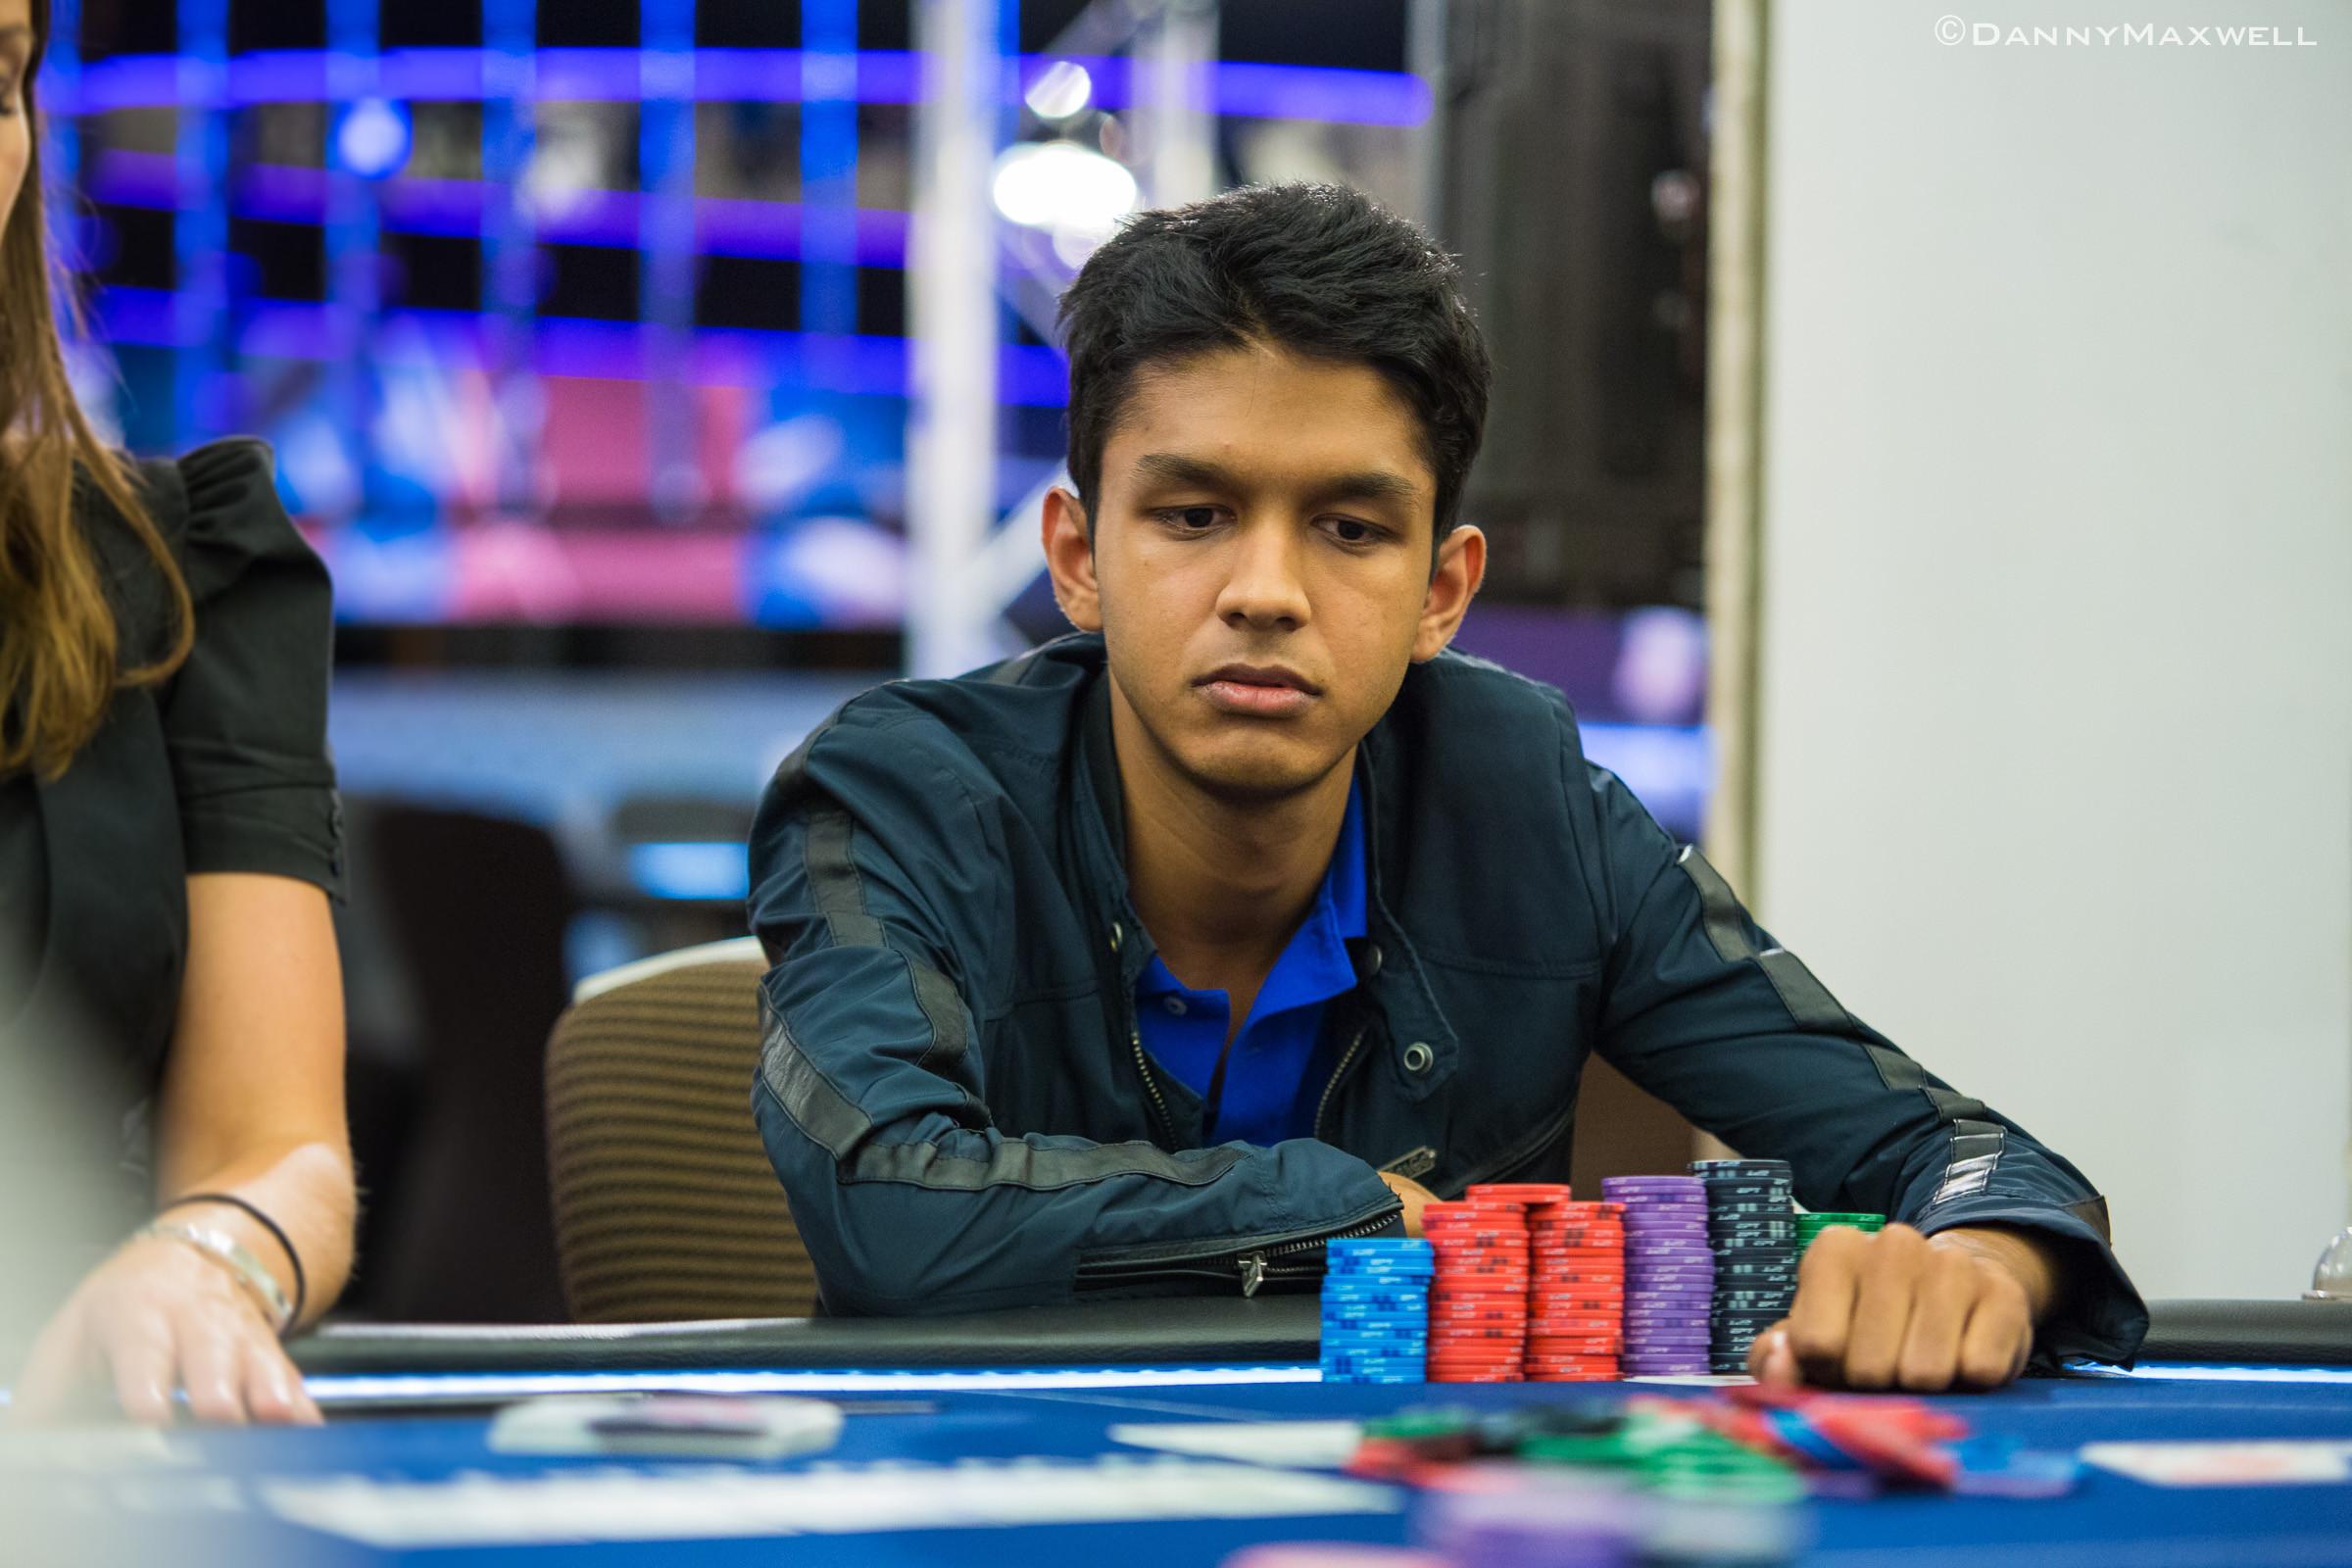 Biggest poker player